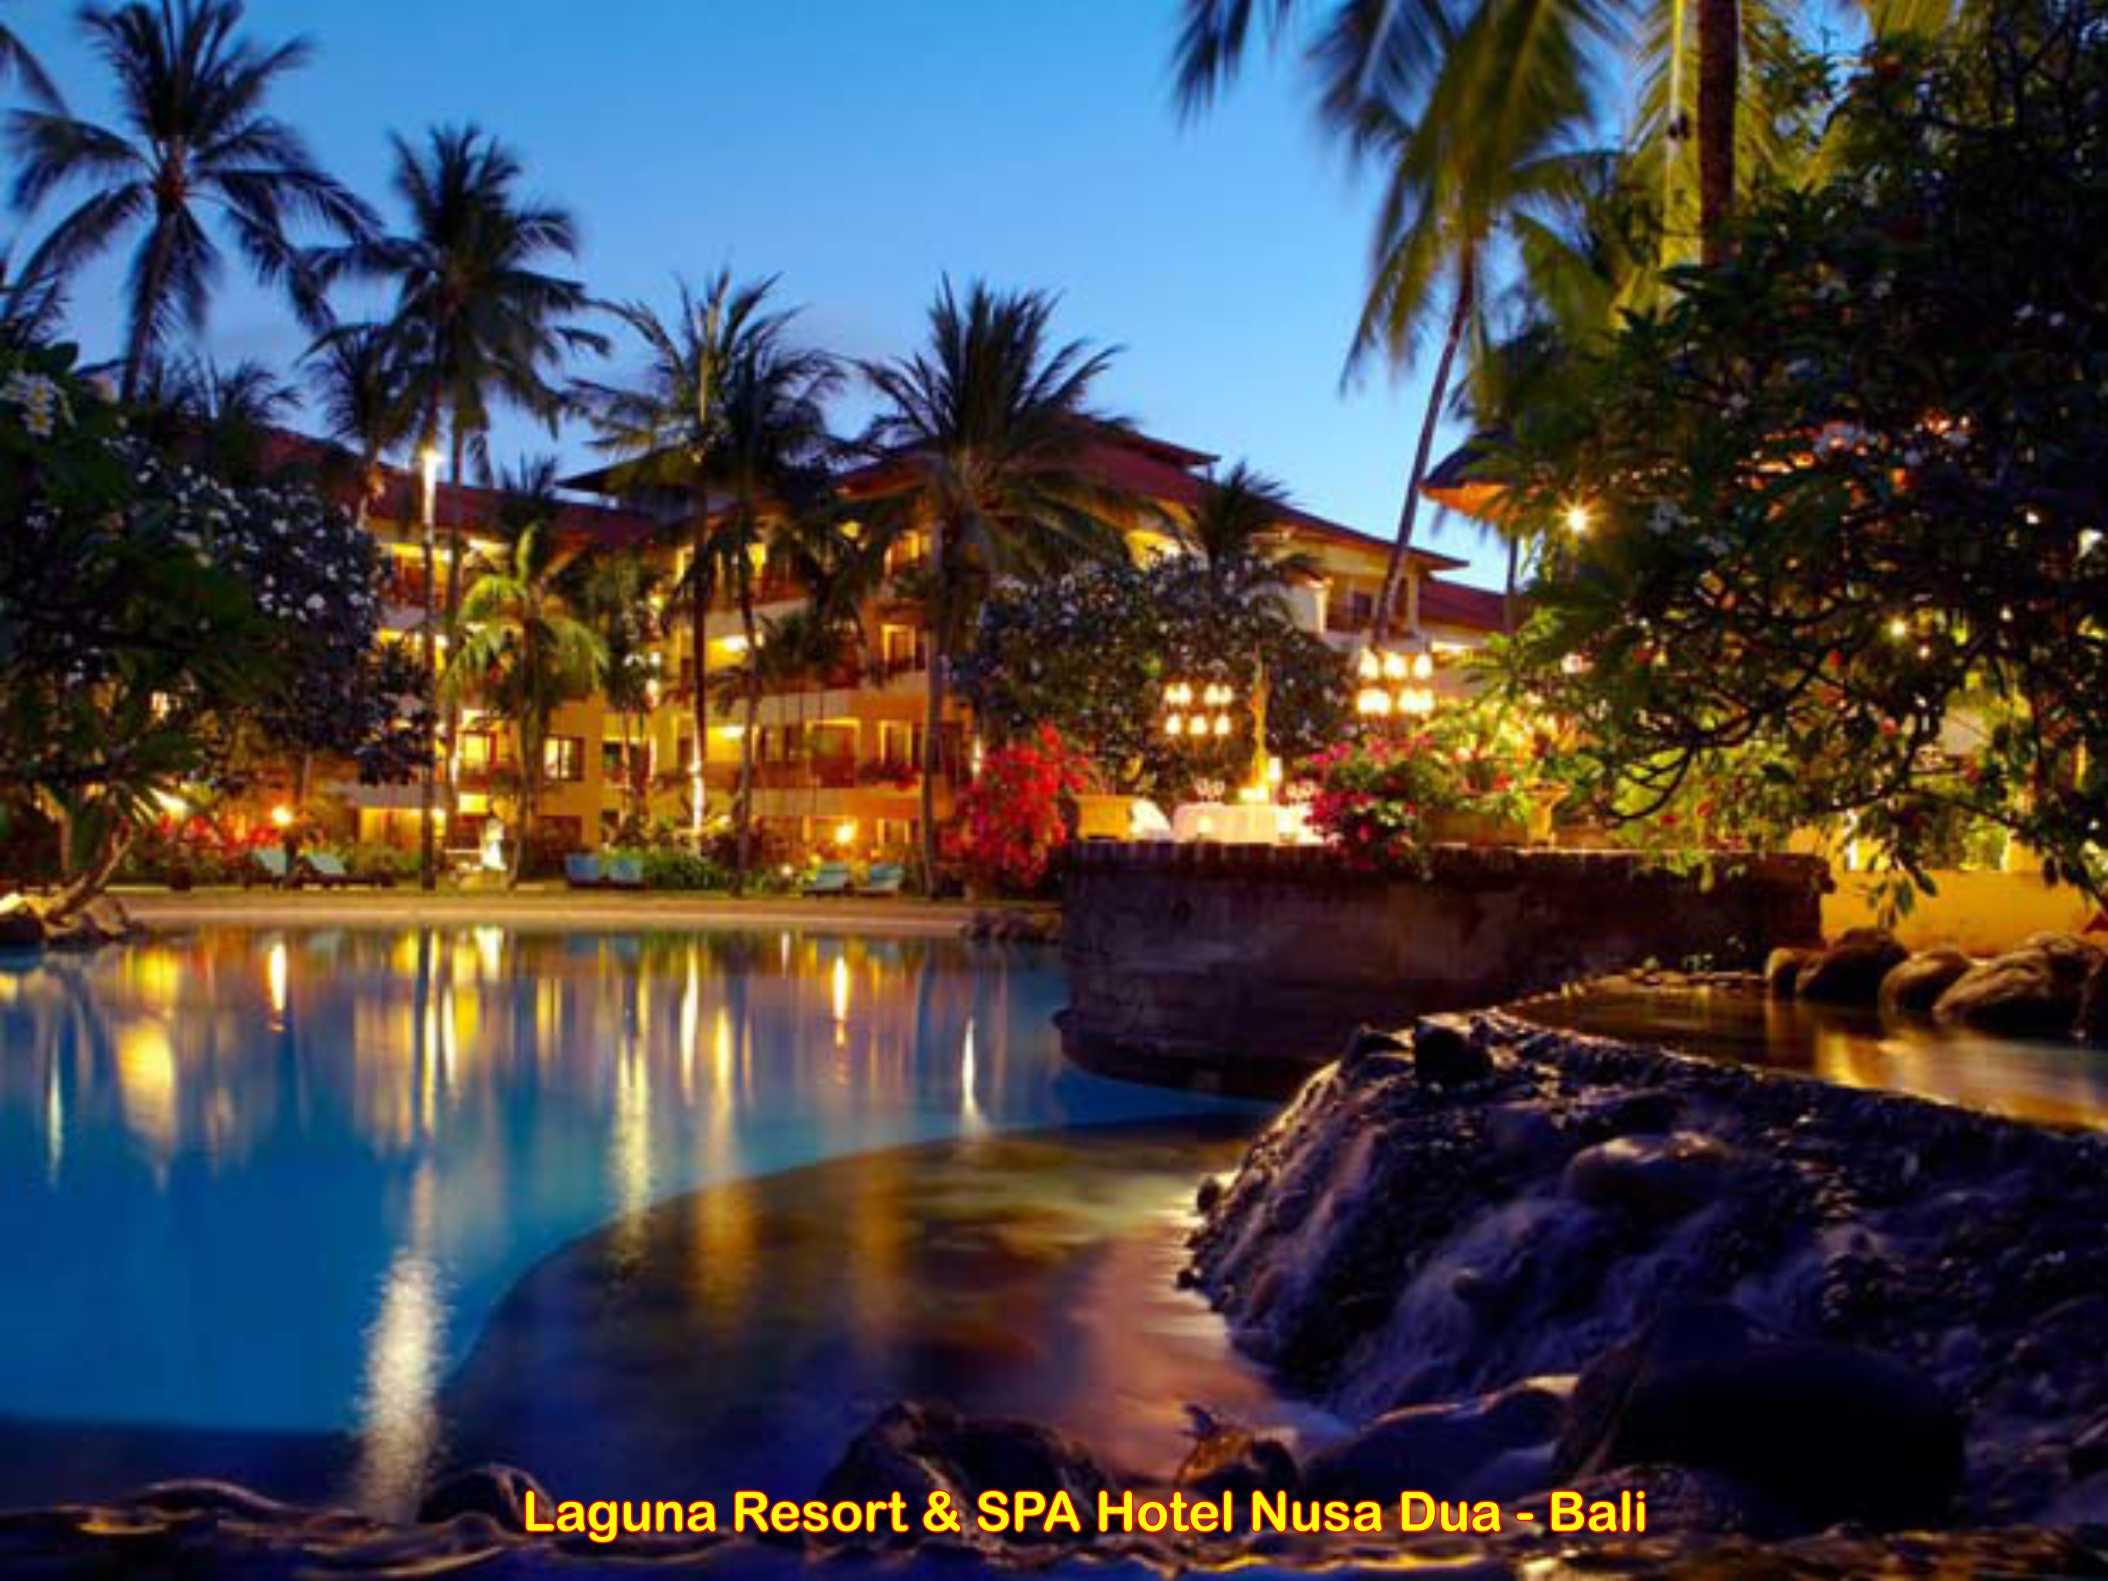 Laguna Resort & Spa Hotel Nusa Dua, Bali - Indonesia 1